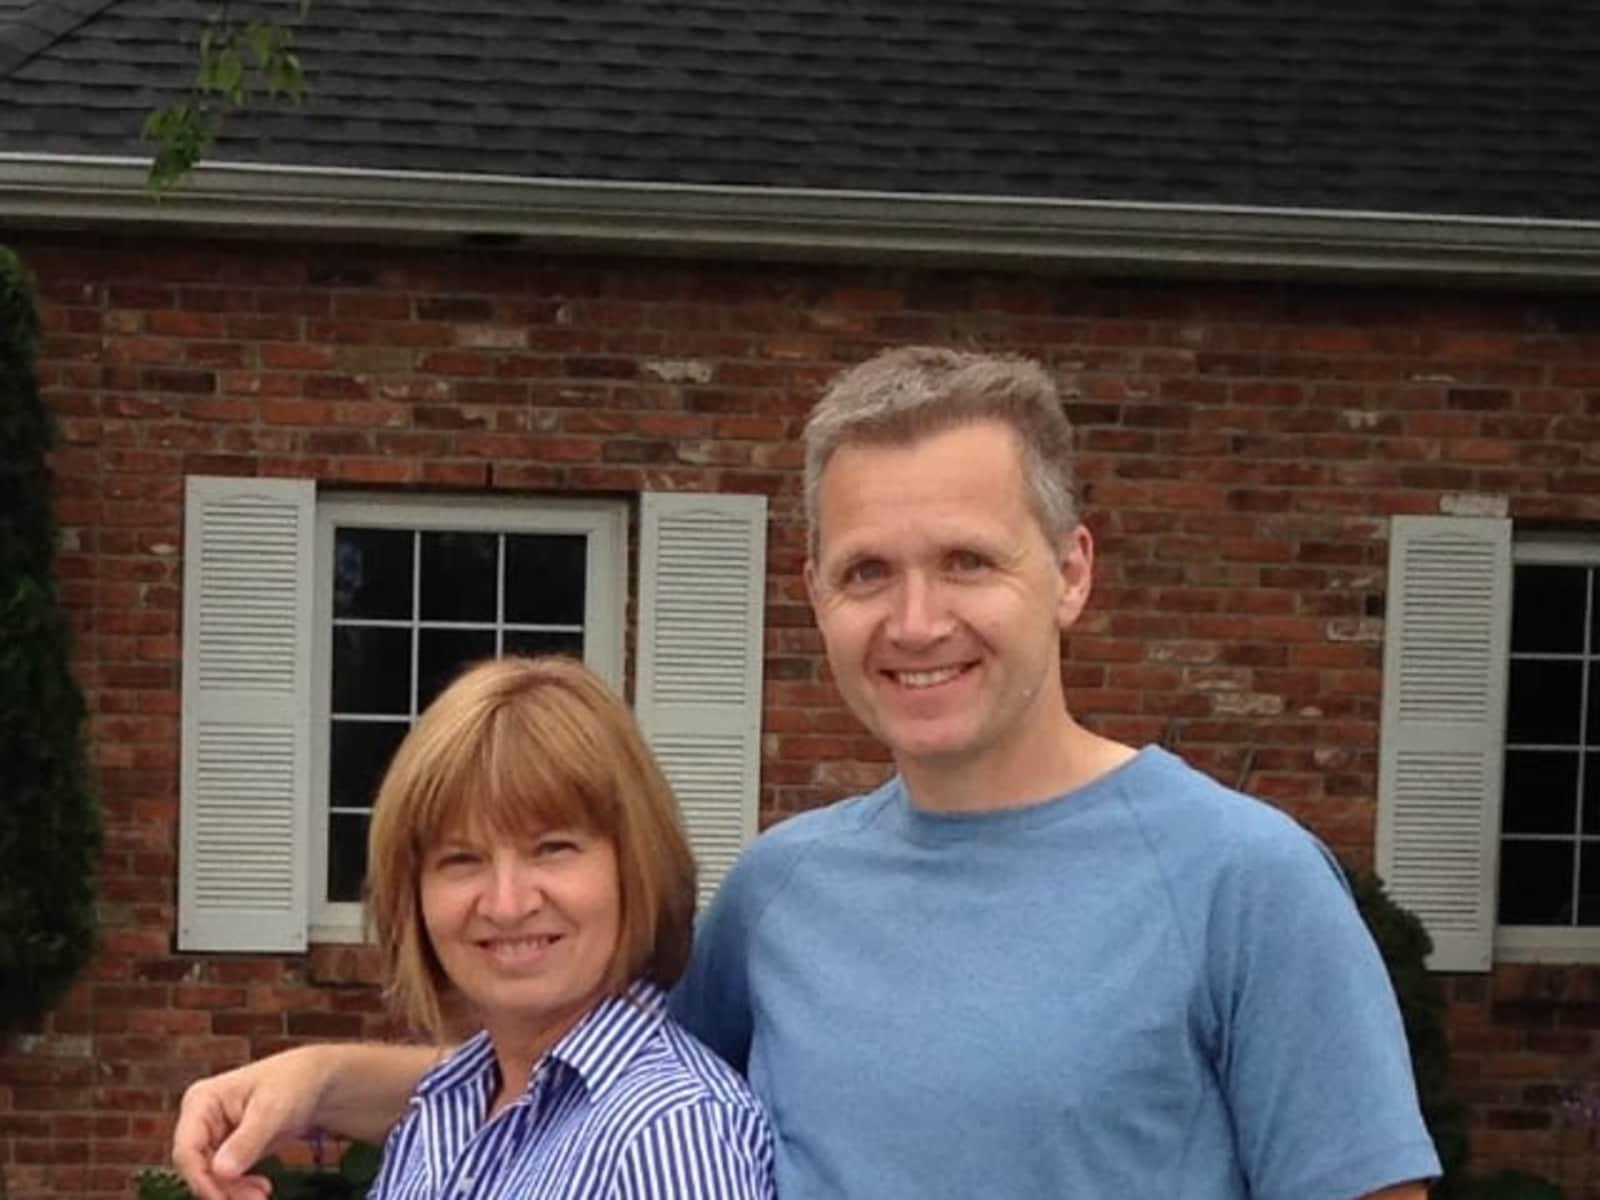 Brenda & Darcy from Windsor, Ontario, Canada